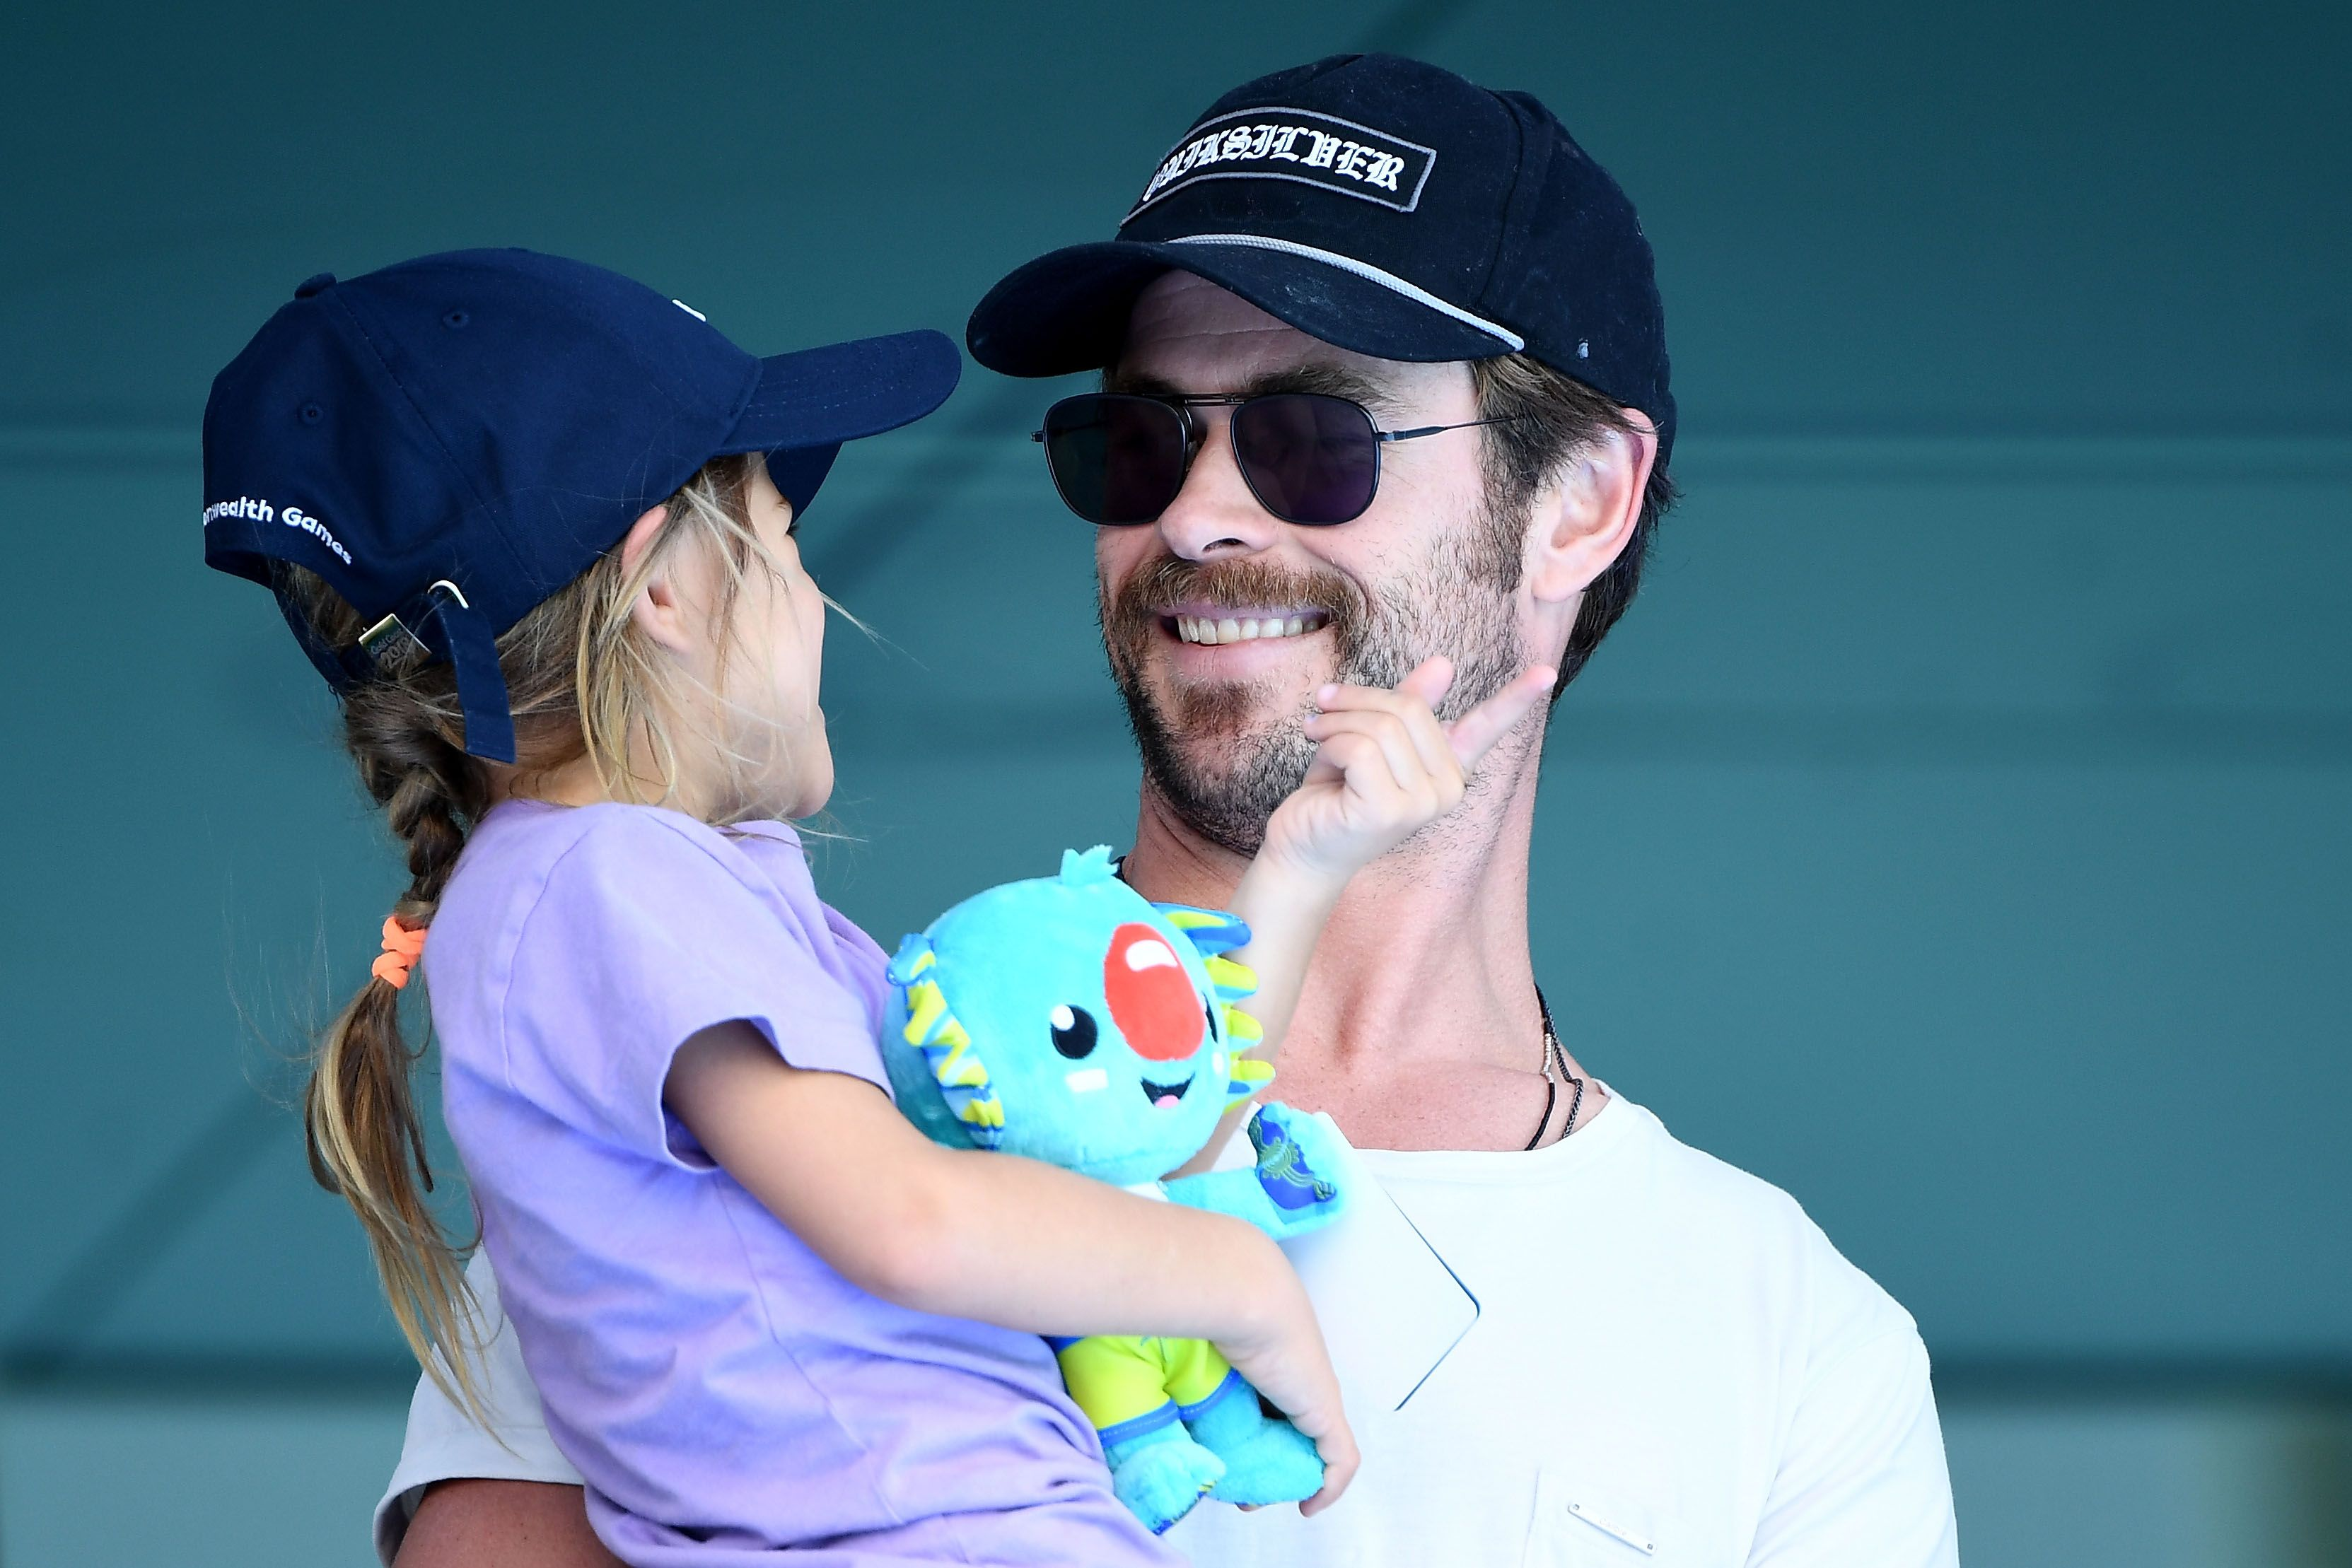 Chris Hemsworth Snuck His Daughter Onto A Disney Ride - Avengers Cast on Jimmy Kimmel